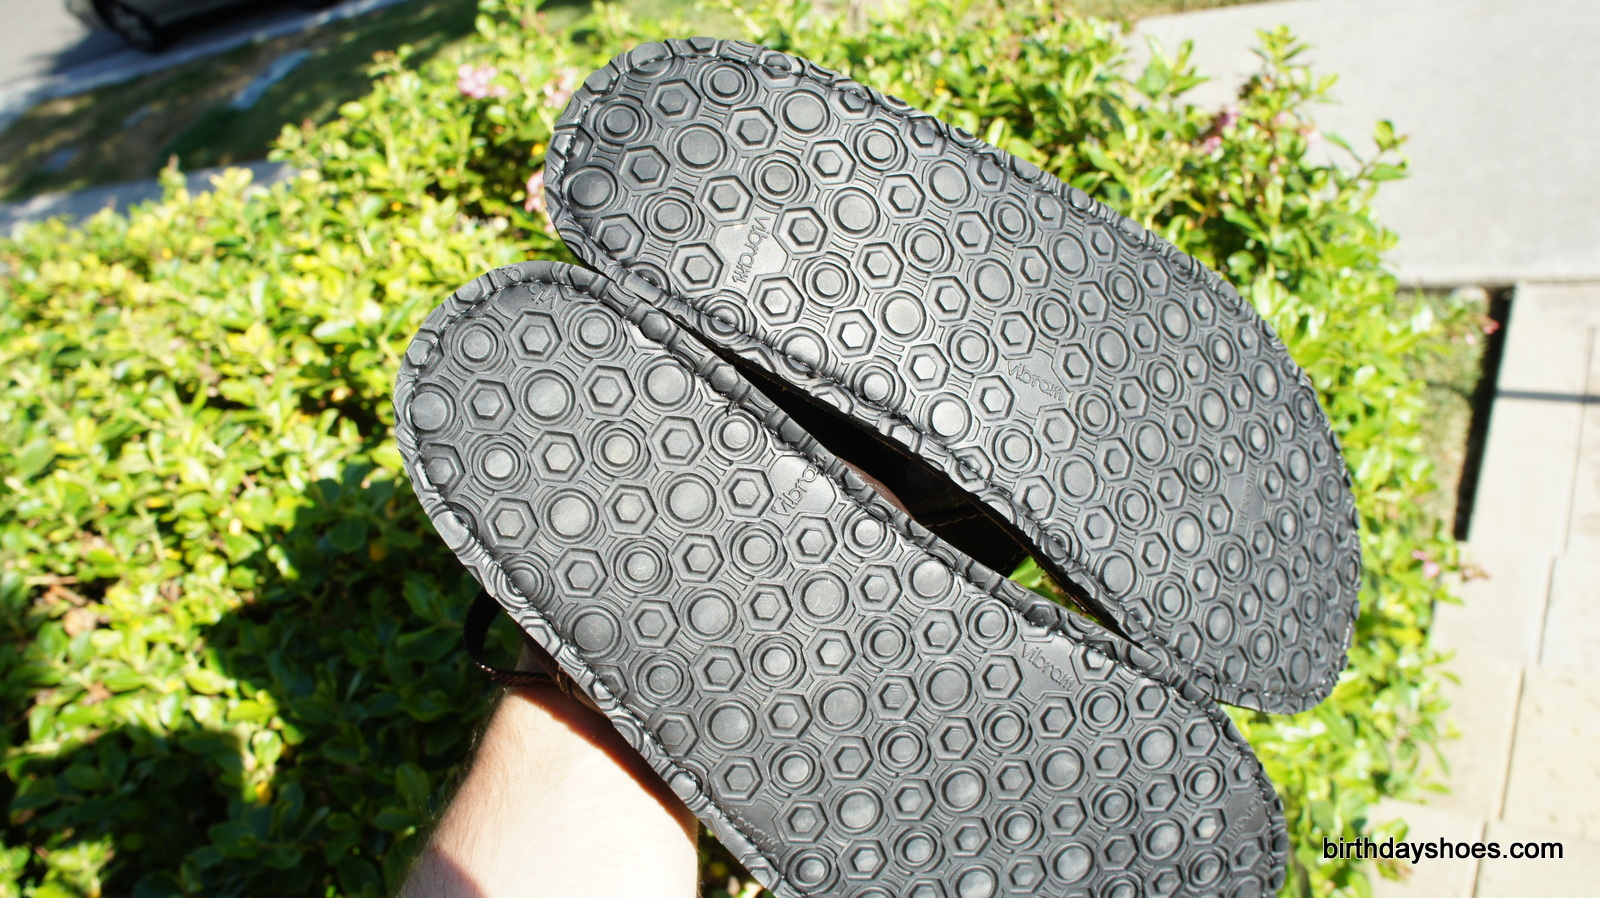 The Geo sole with it's geometric tread design.